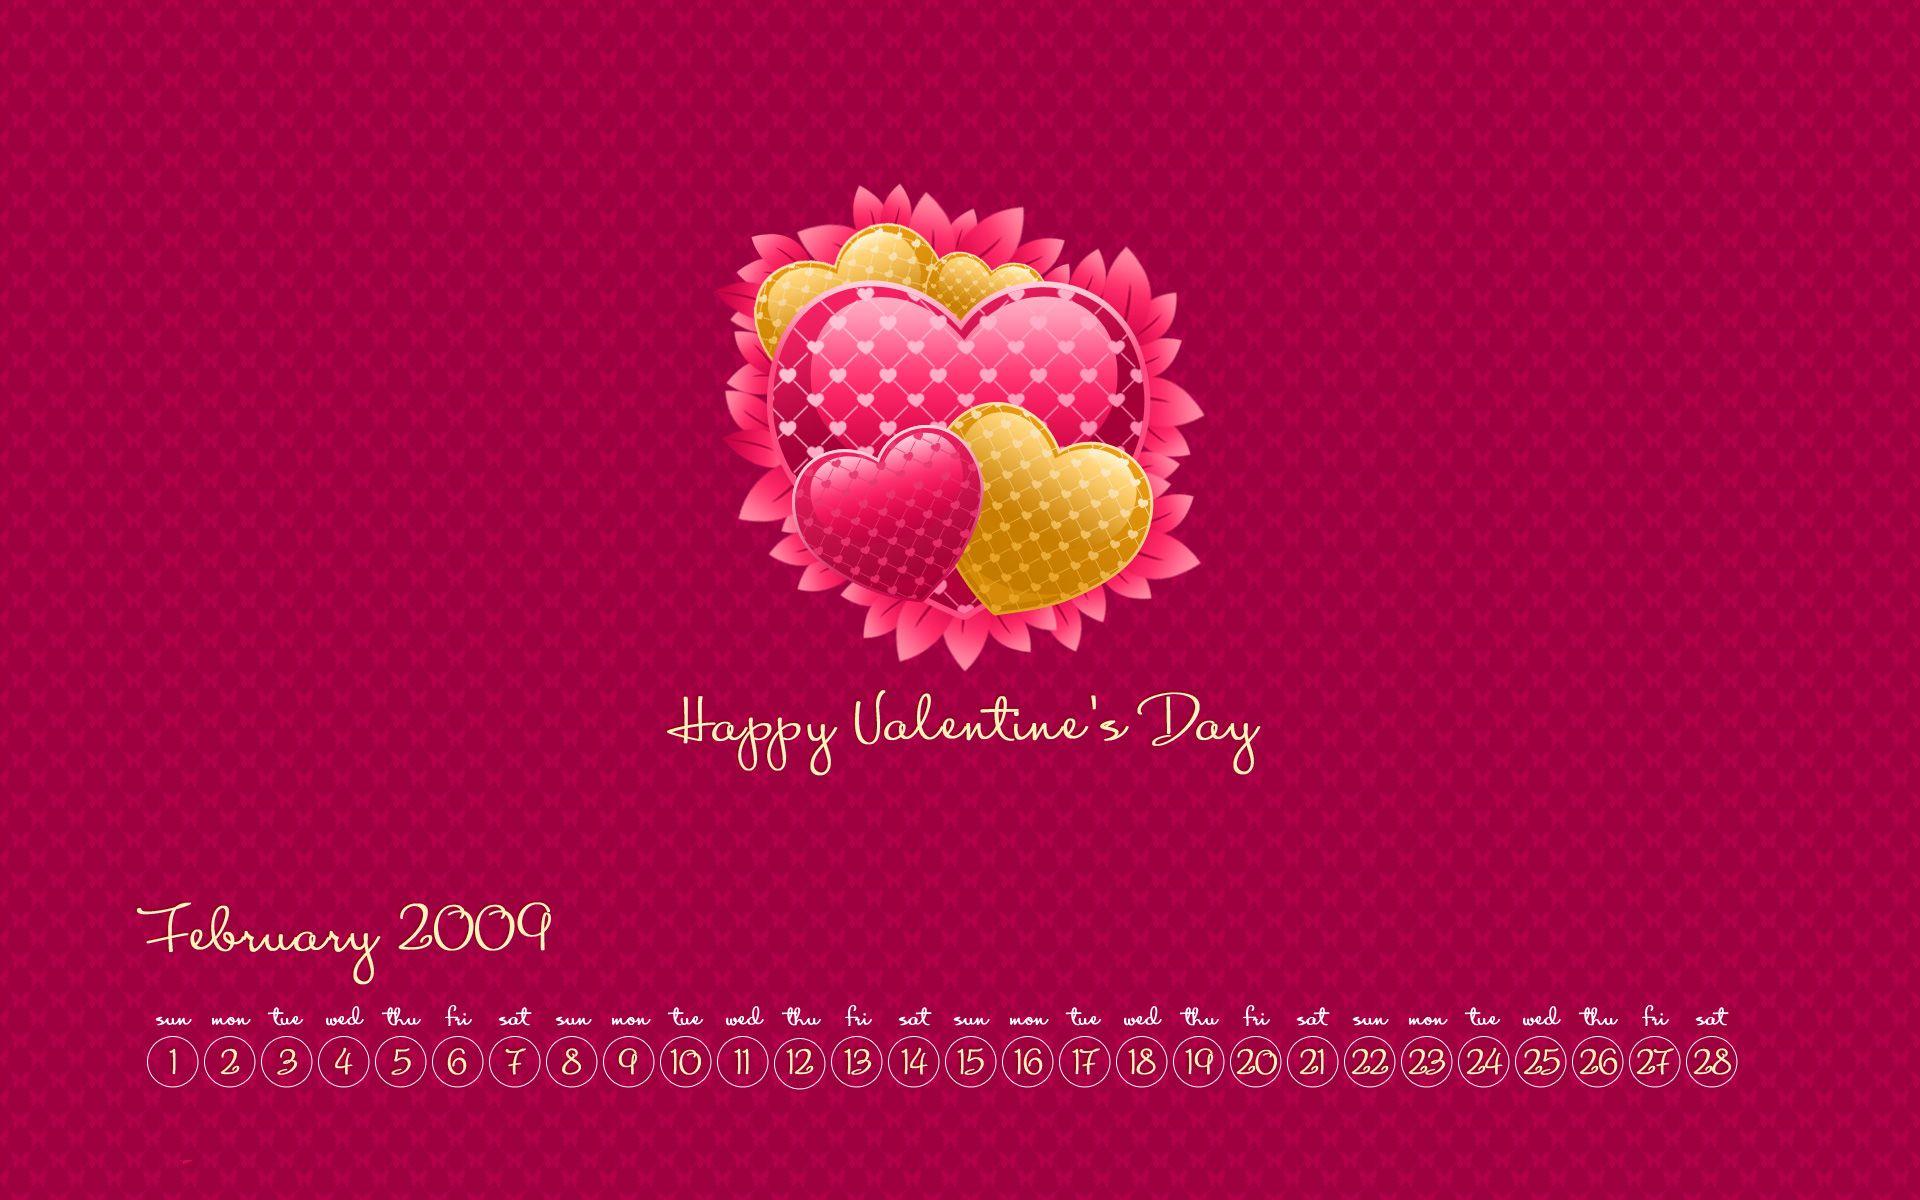 Create February 2009 Calendar Wallpaper In Photoshop Cs4